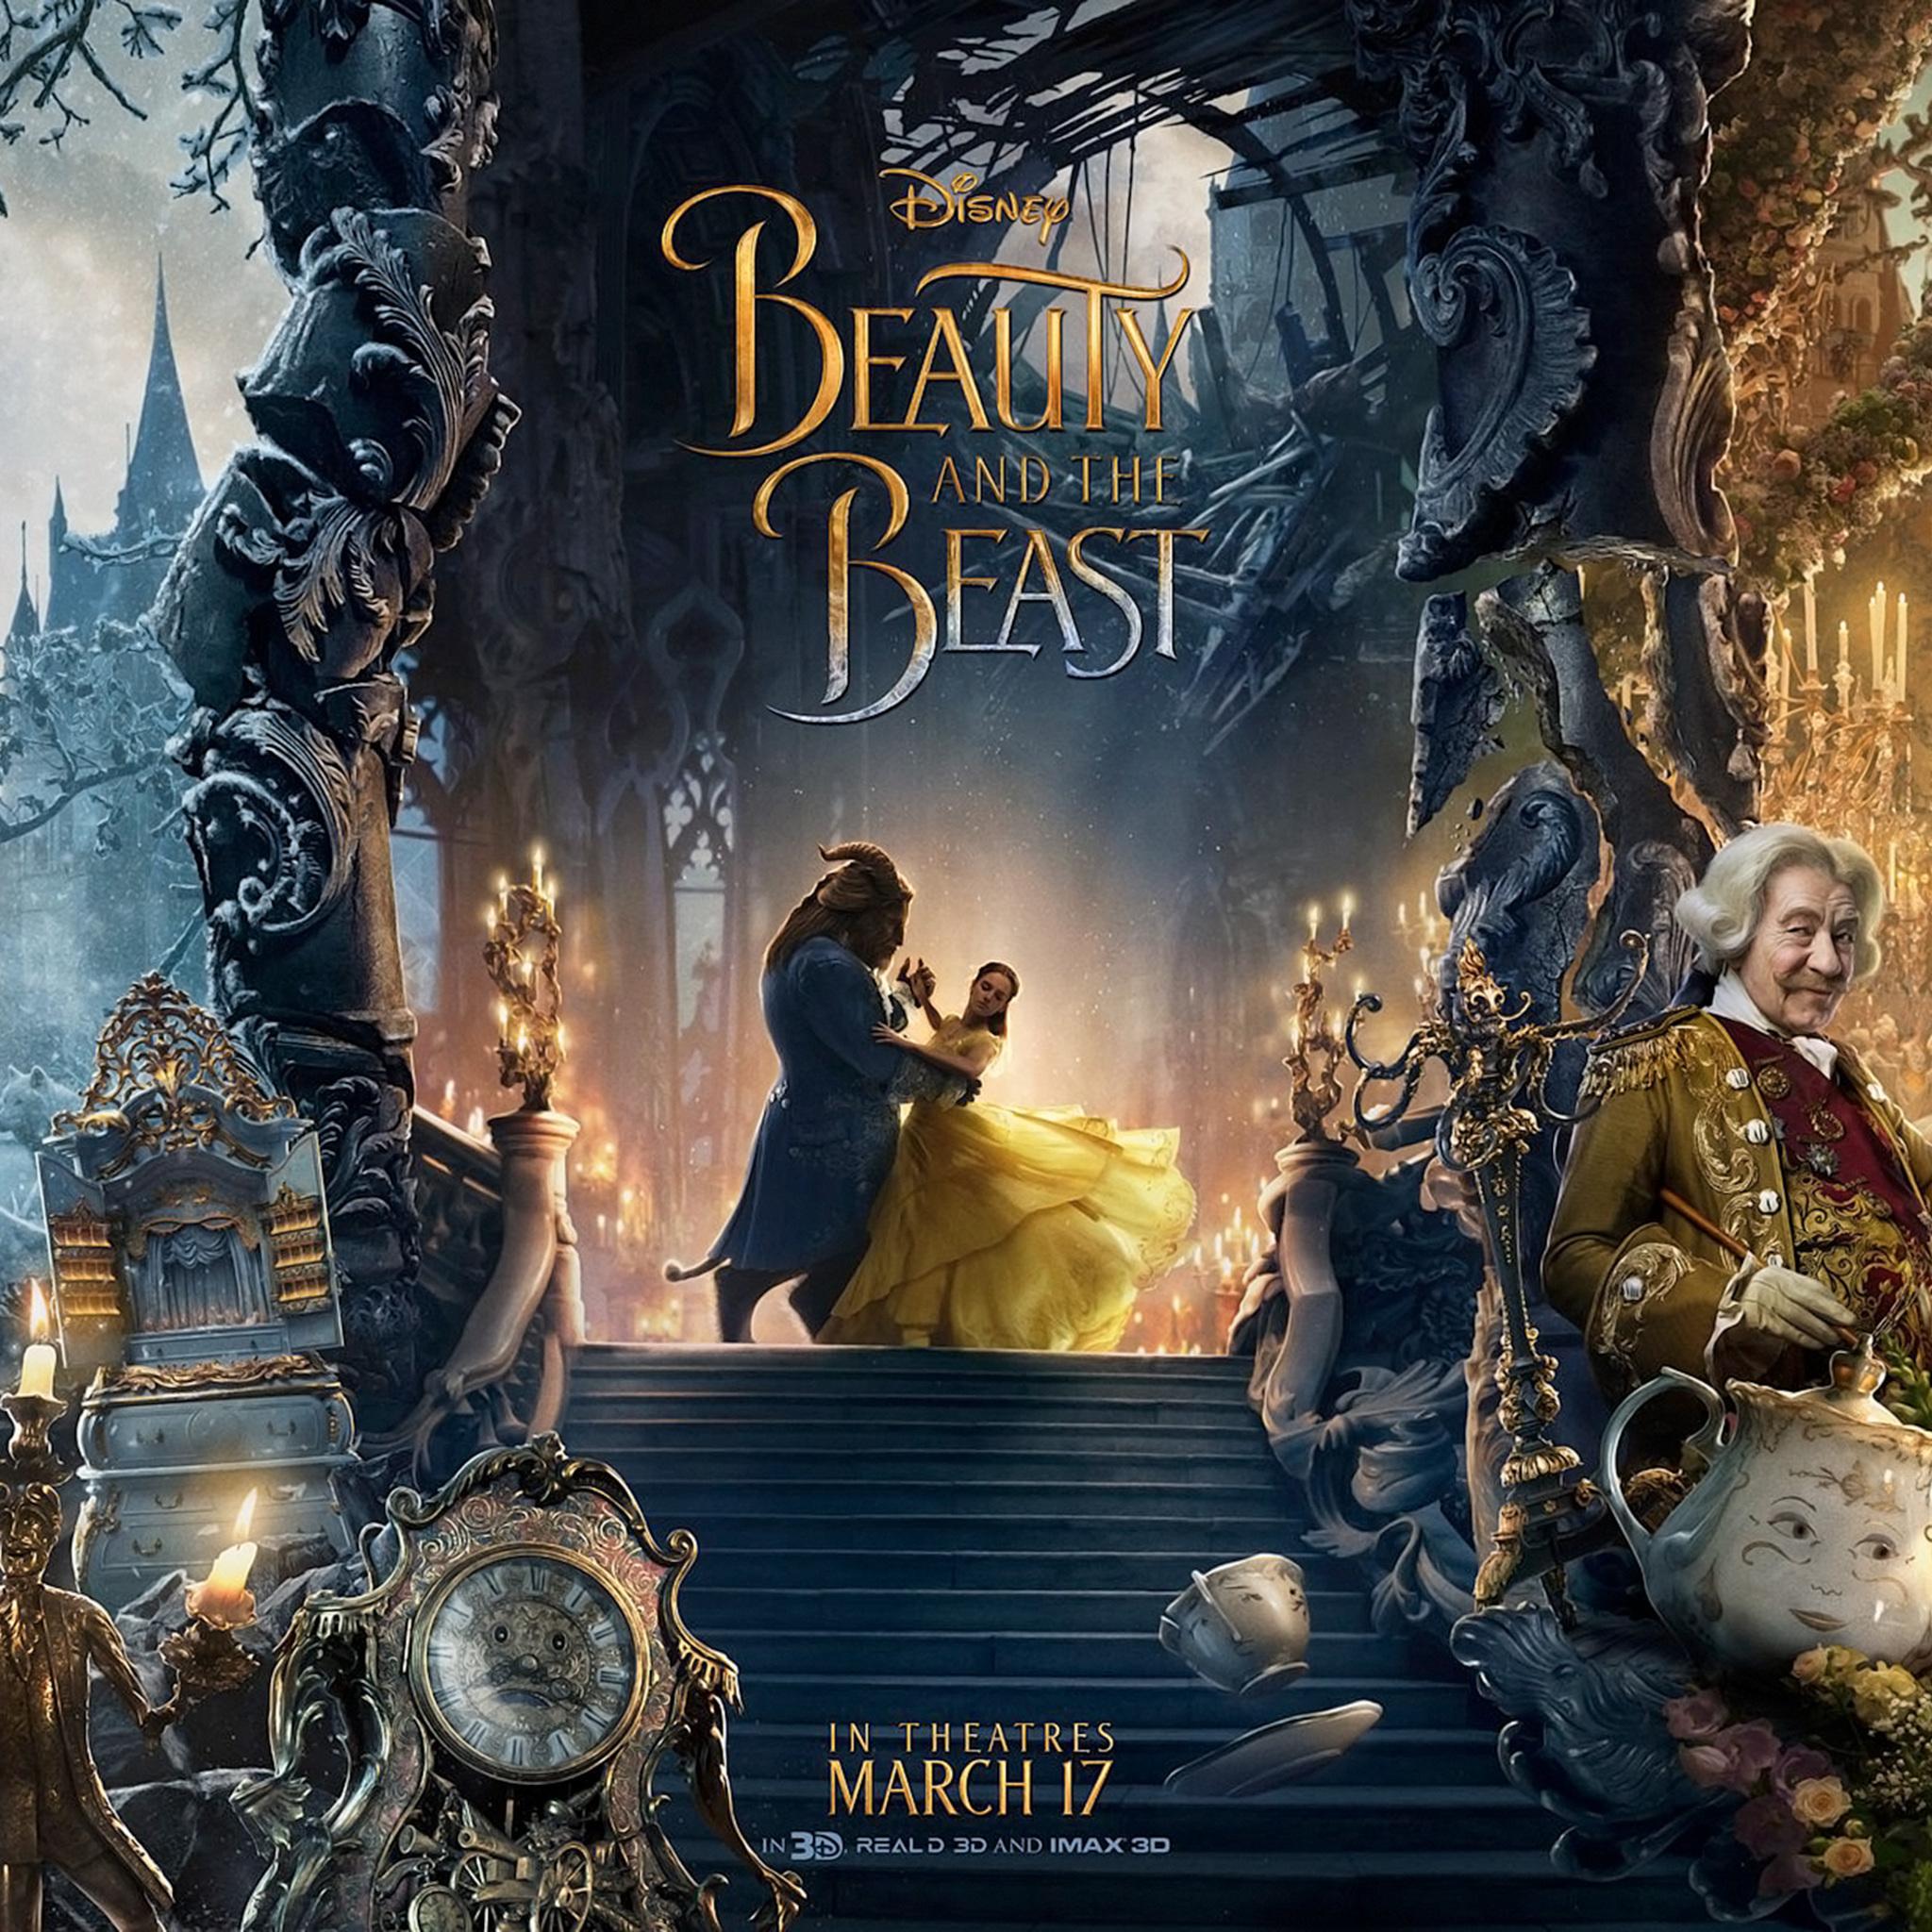 2048x2048 Beauty And The Beast 4k Ipad Air HD 4k